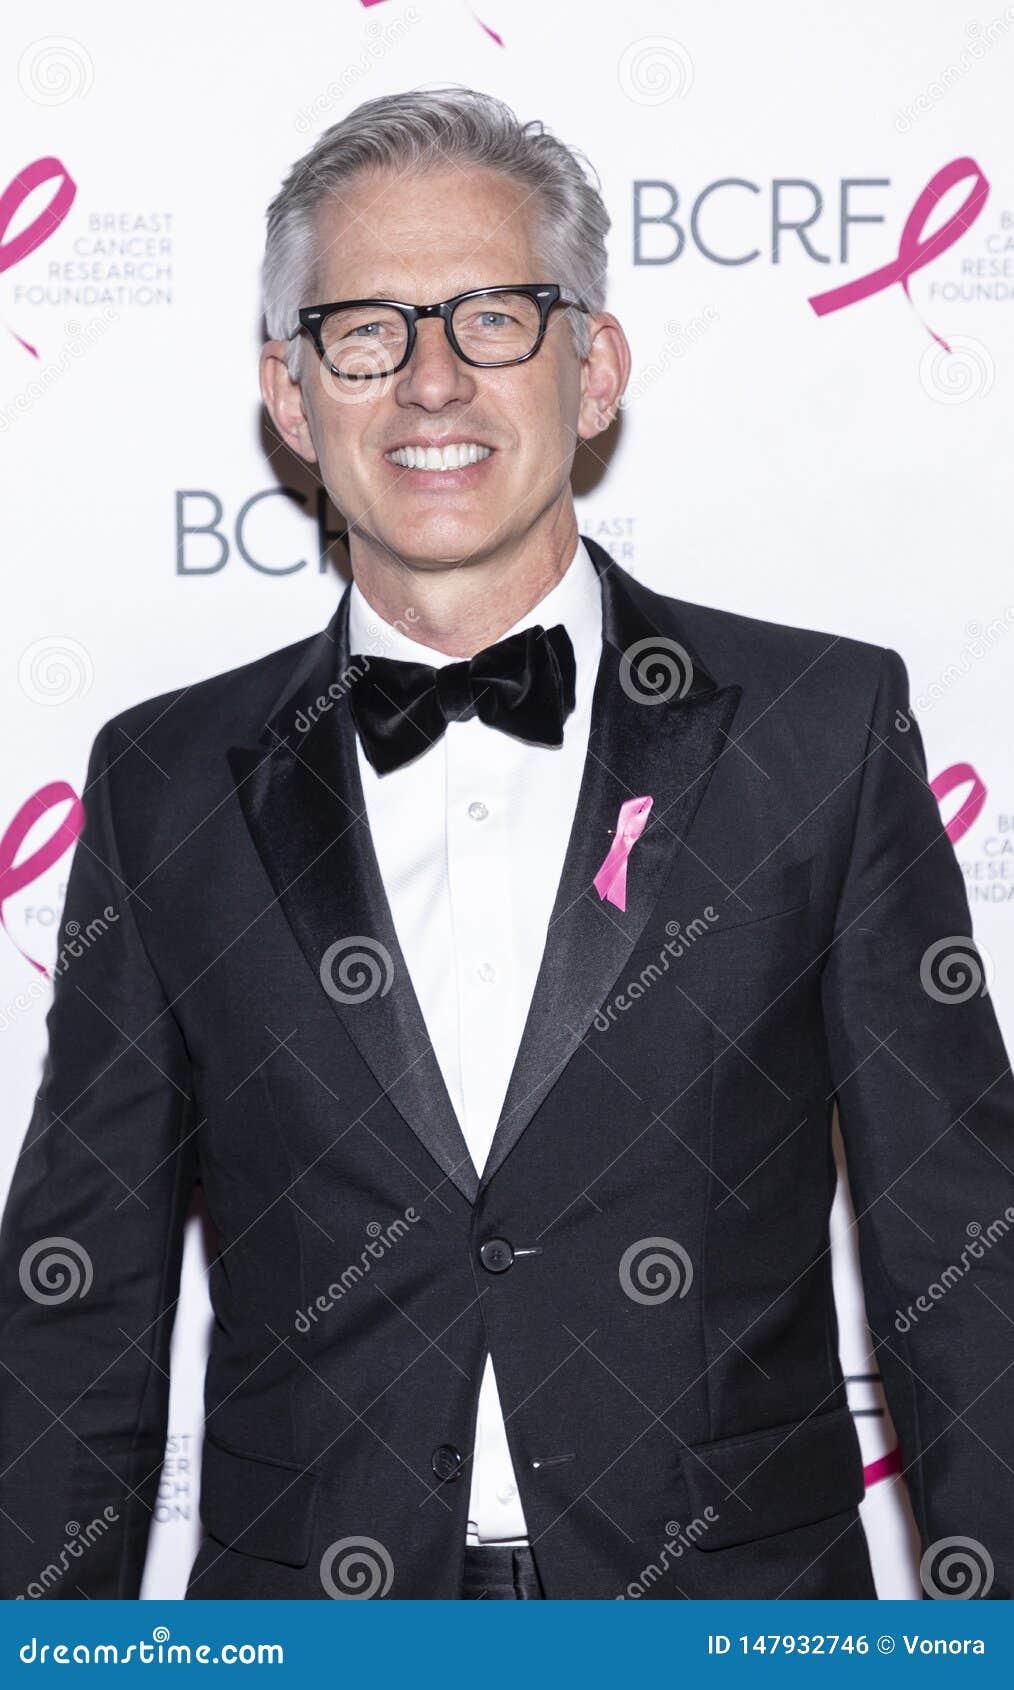 Varma rosa partiankomster f?r BCRF 2019